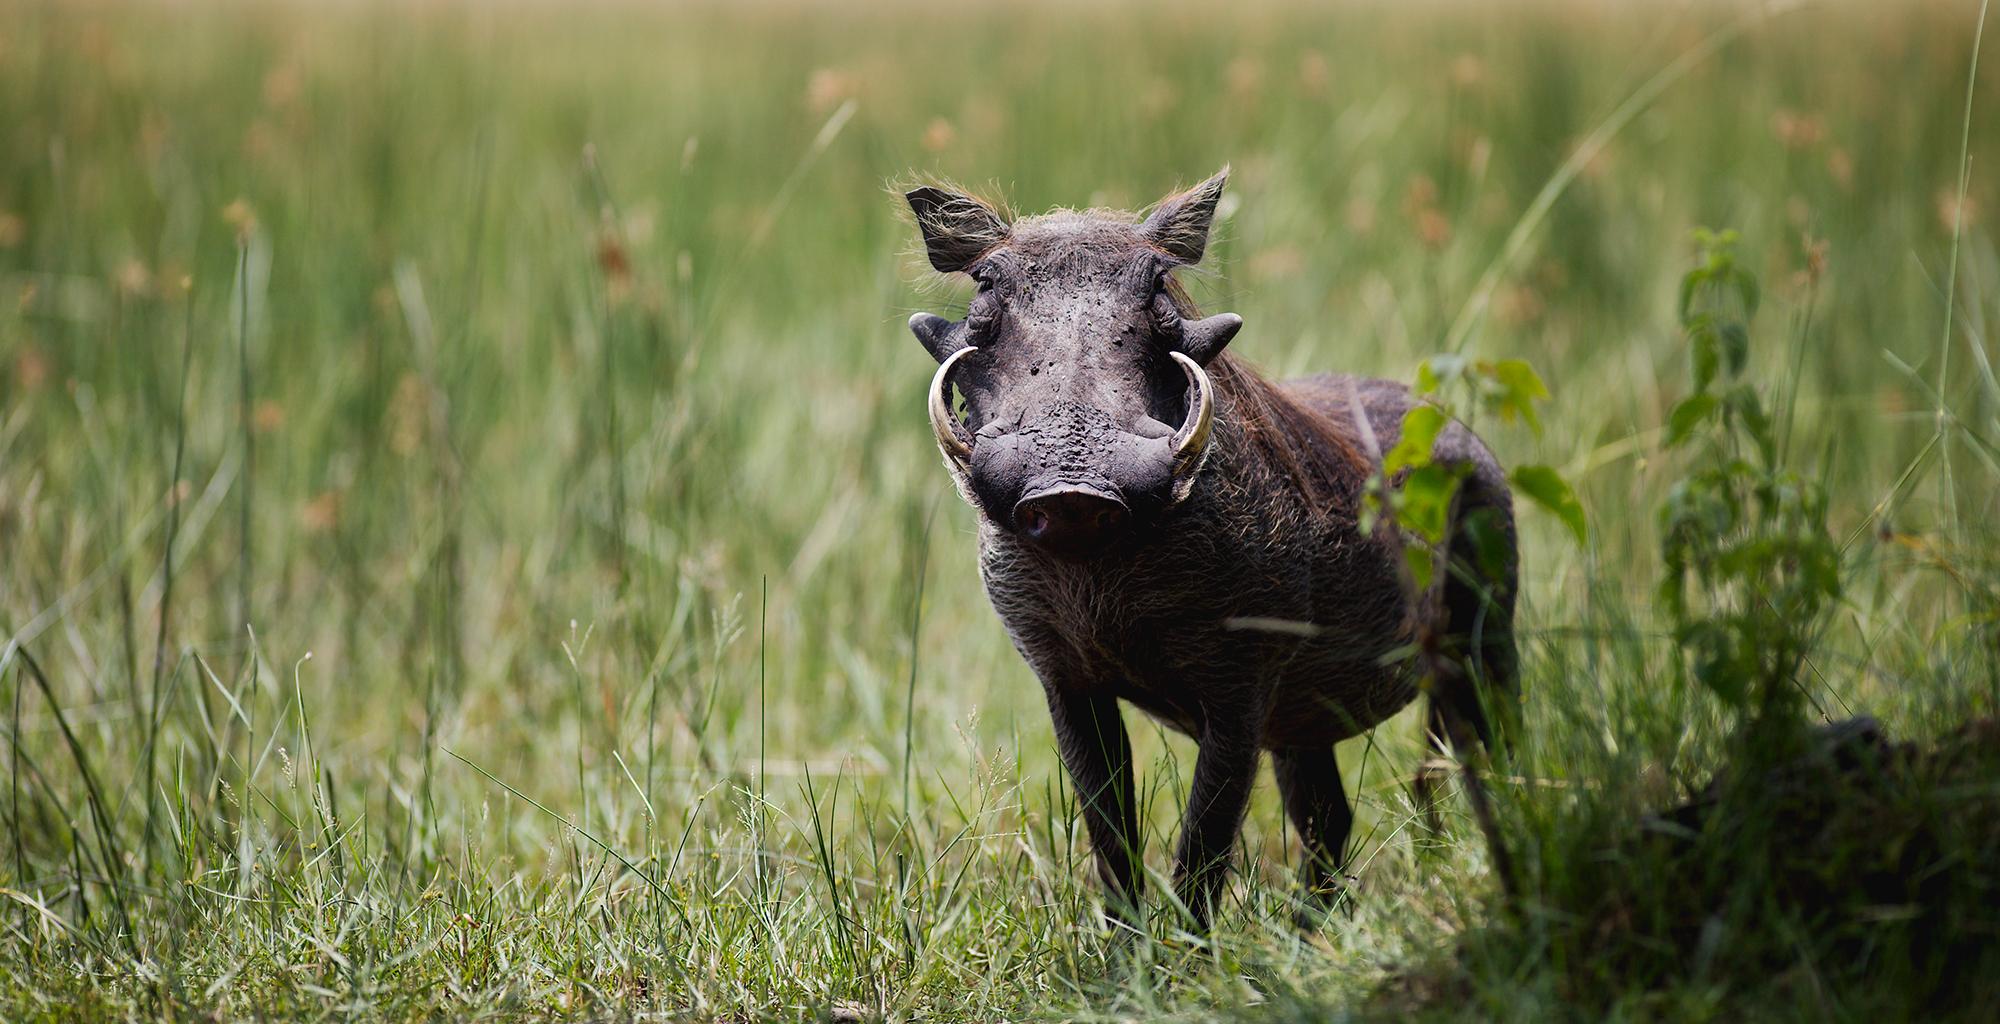 Botswana-Okavango-Delta-Wildlife-Warthog